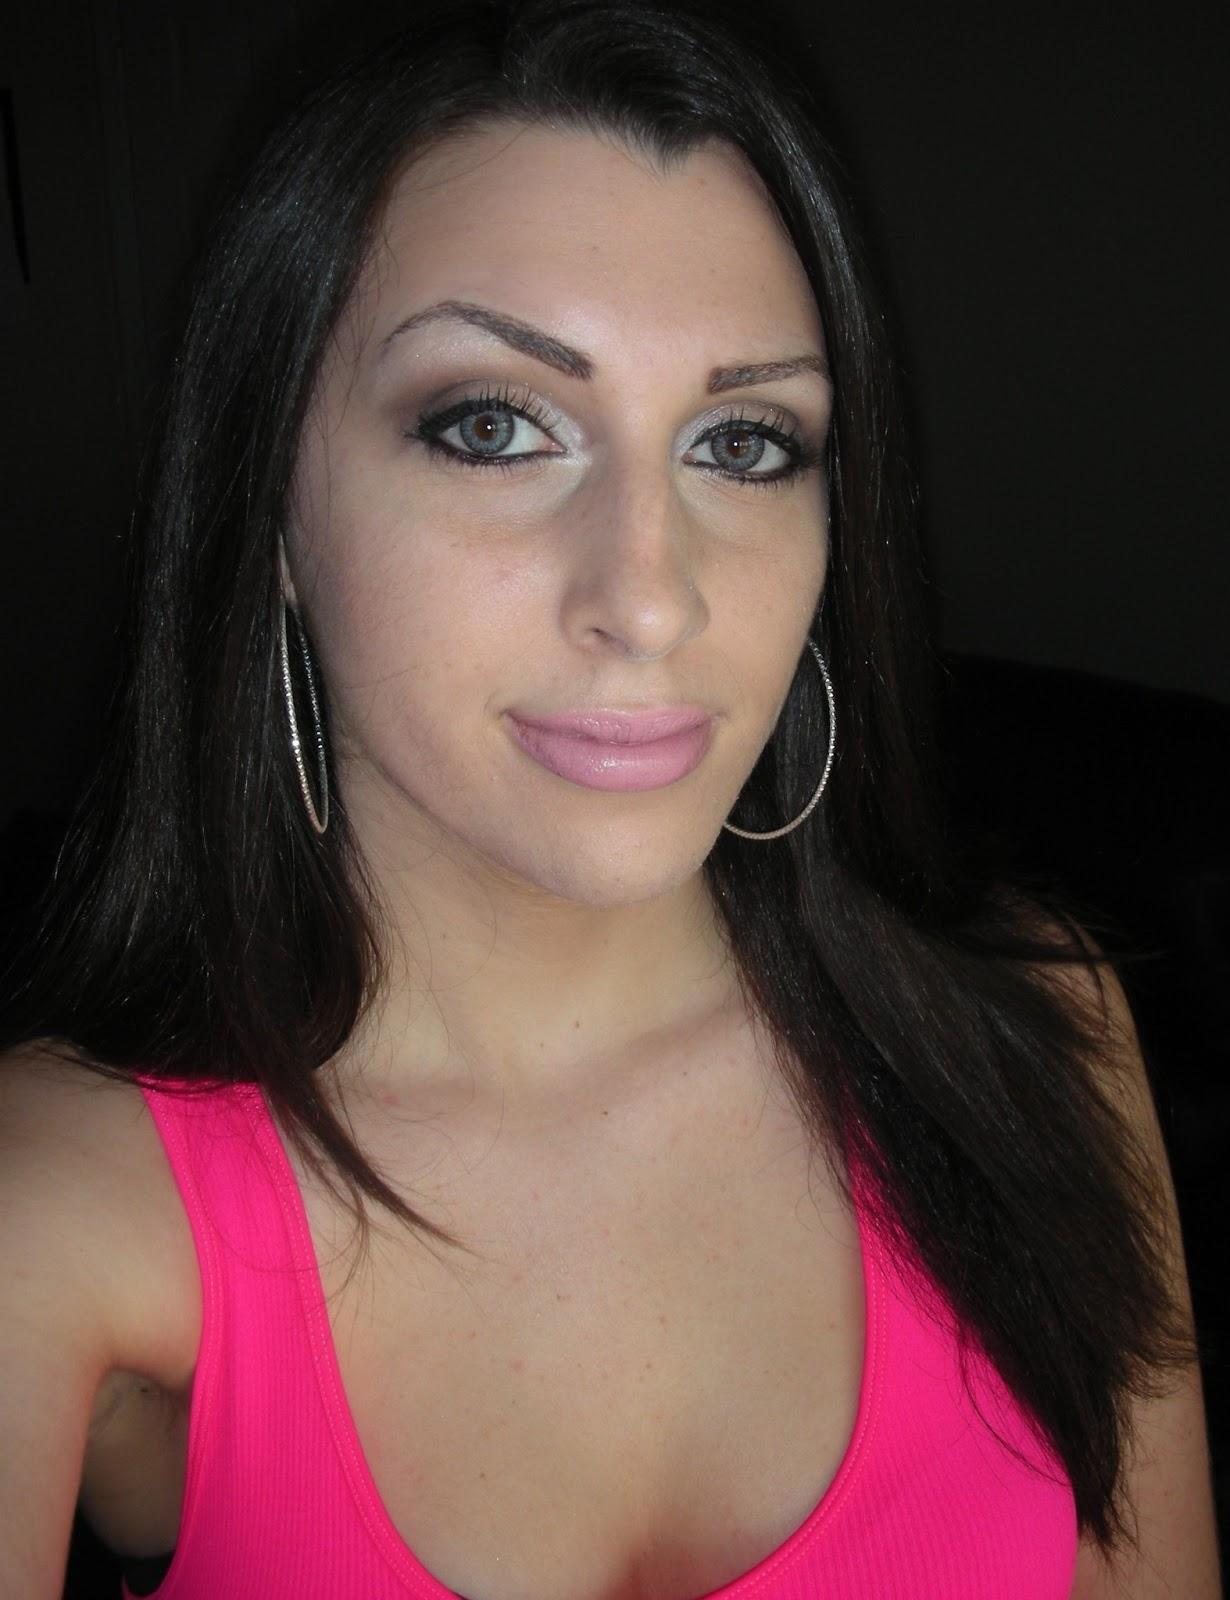 Simple Do Hoop Earrings Belong To Women Of Color  12NEWScom